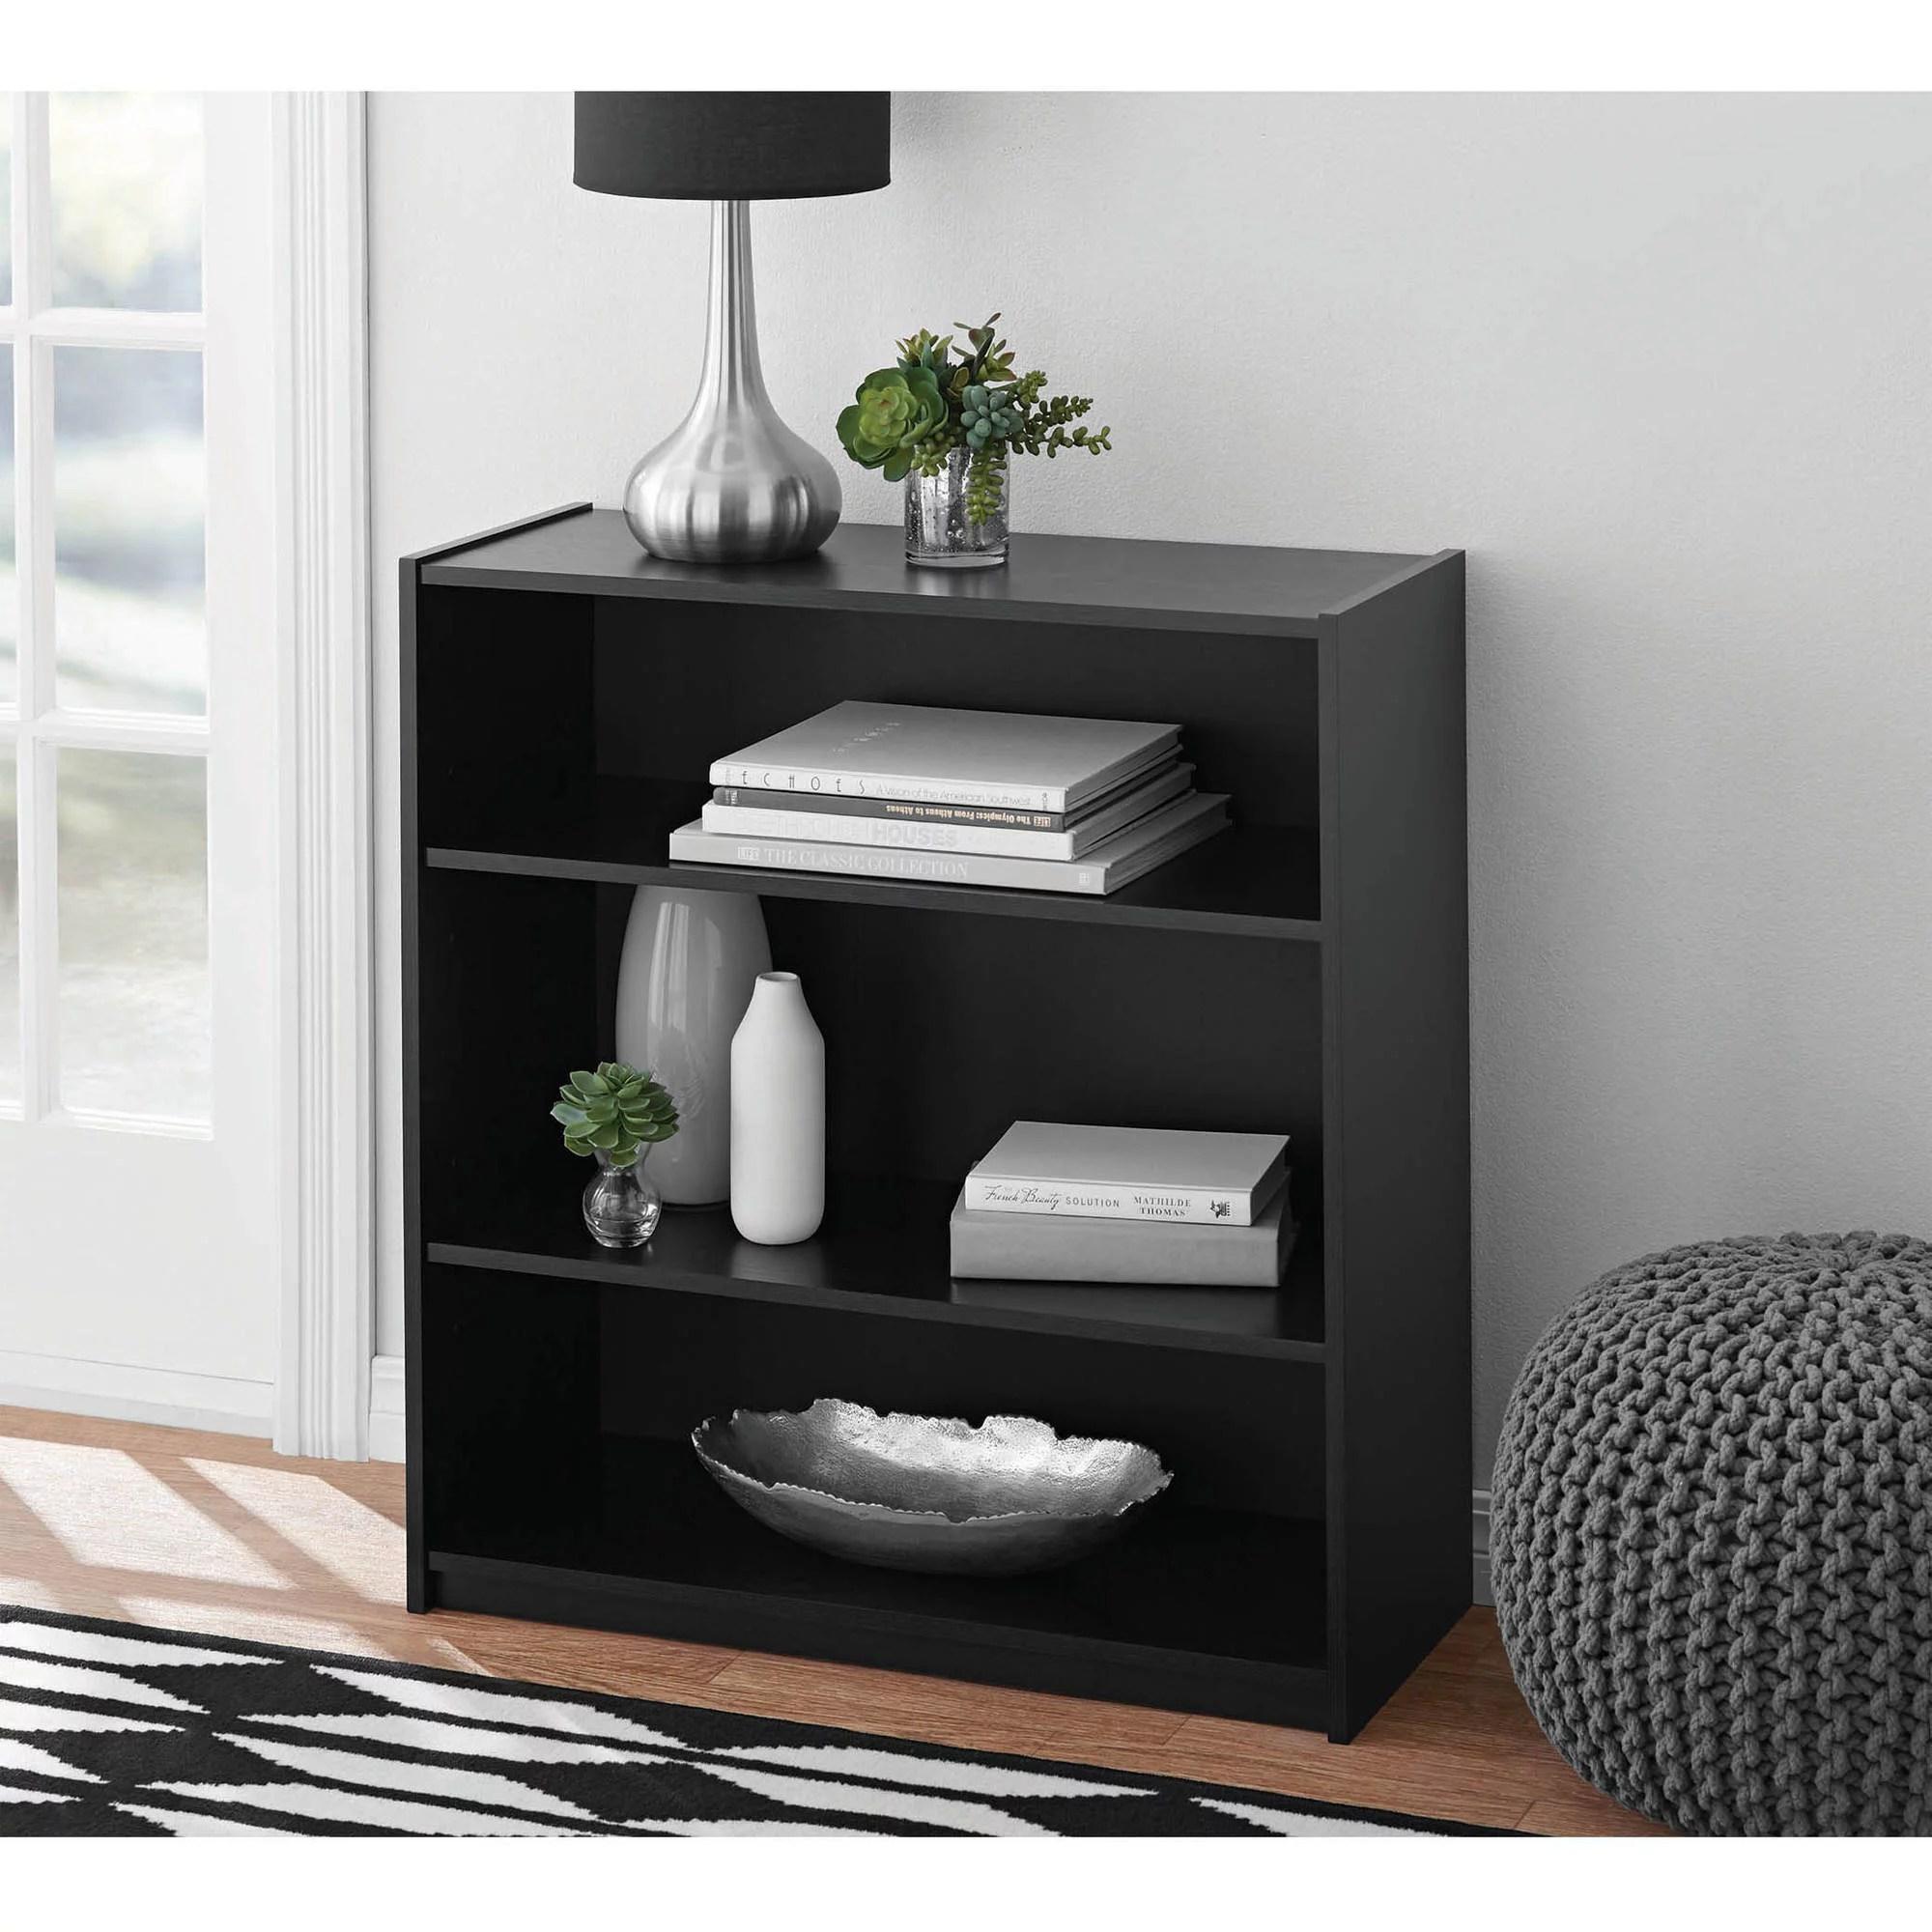 Adjustable 3 Shelf Wood Bookcase Storage Shelving Book